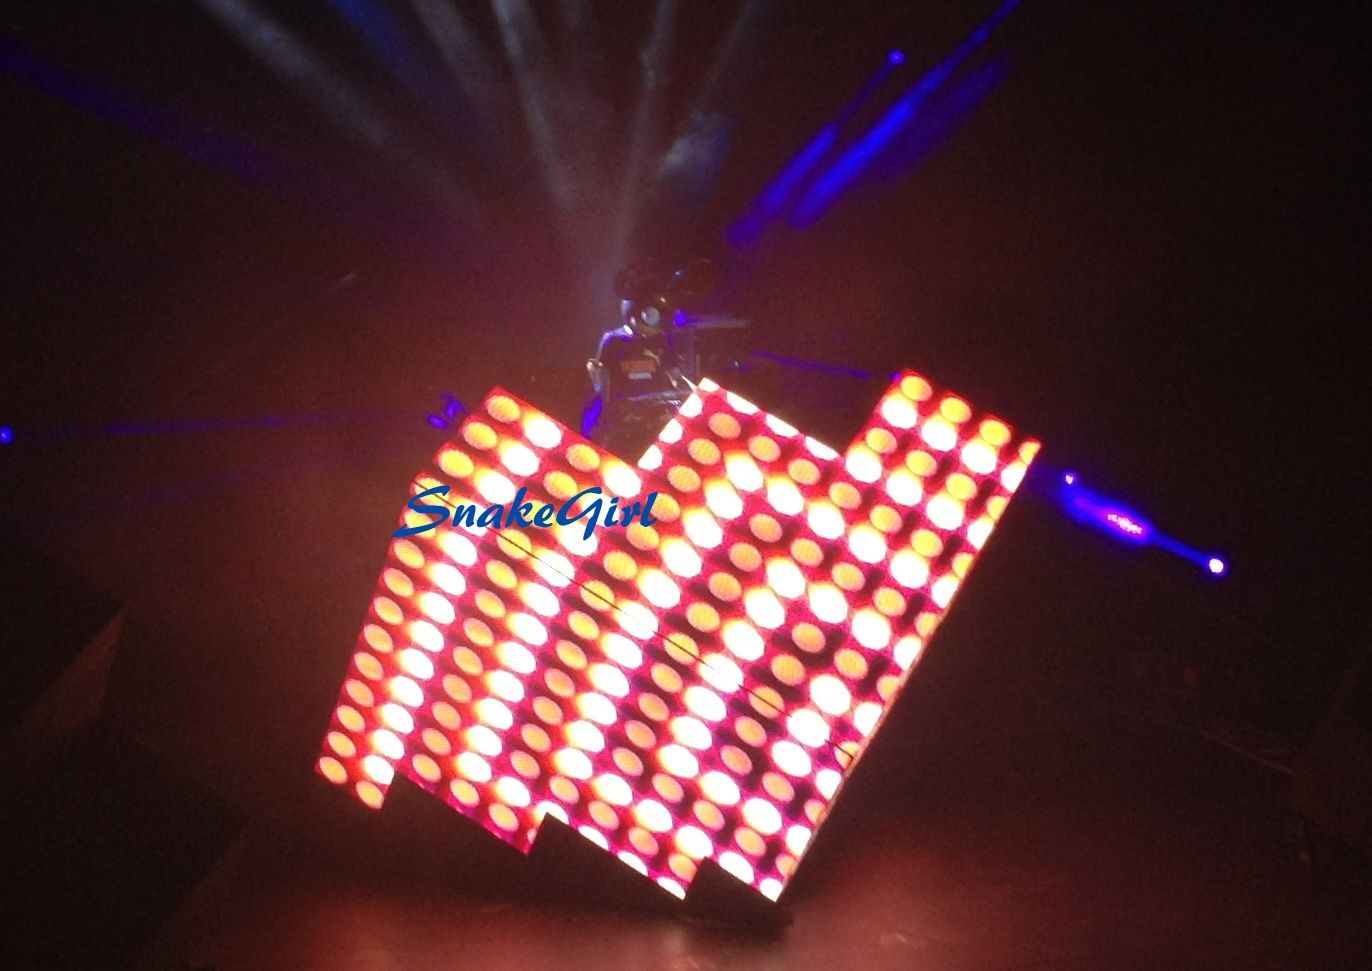 Concert DEADMAU5